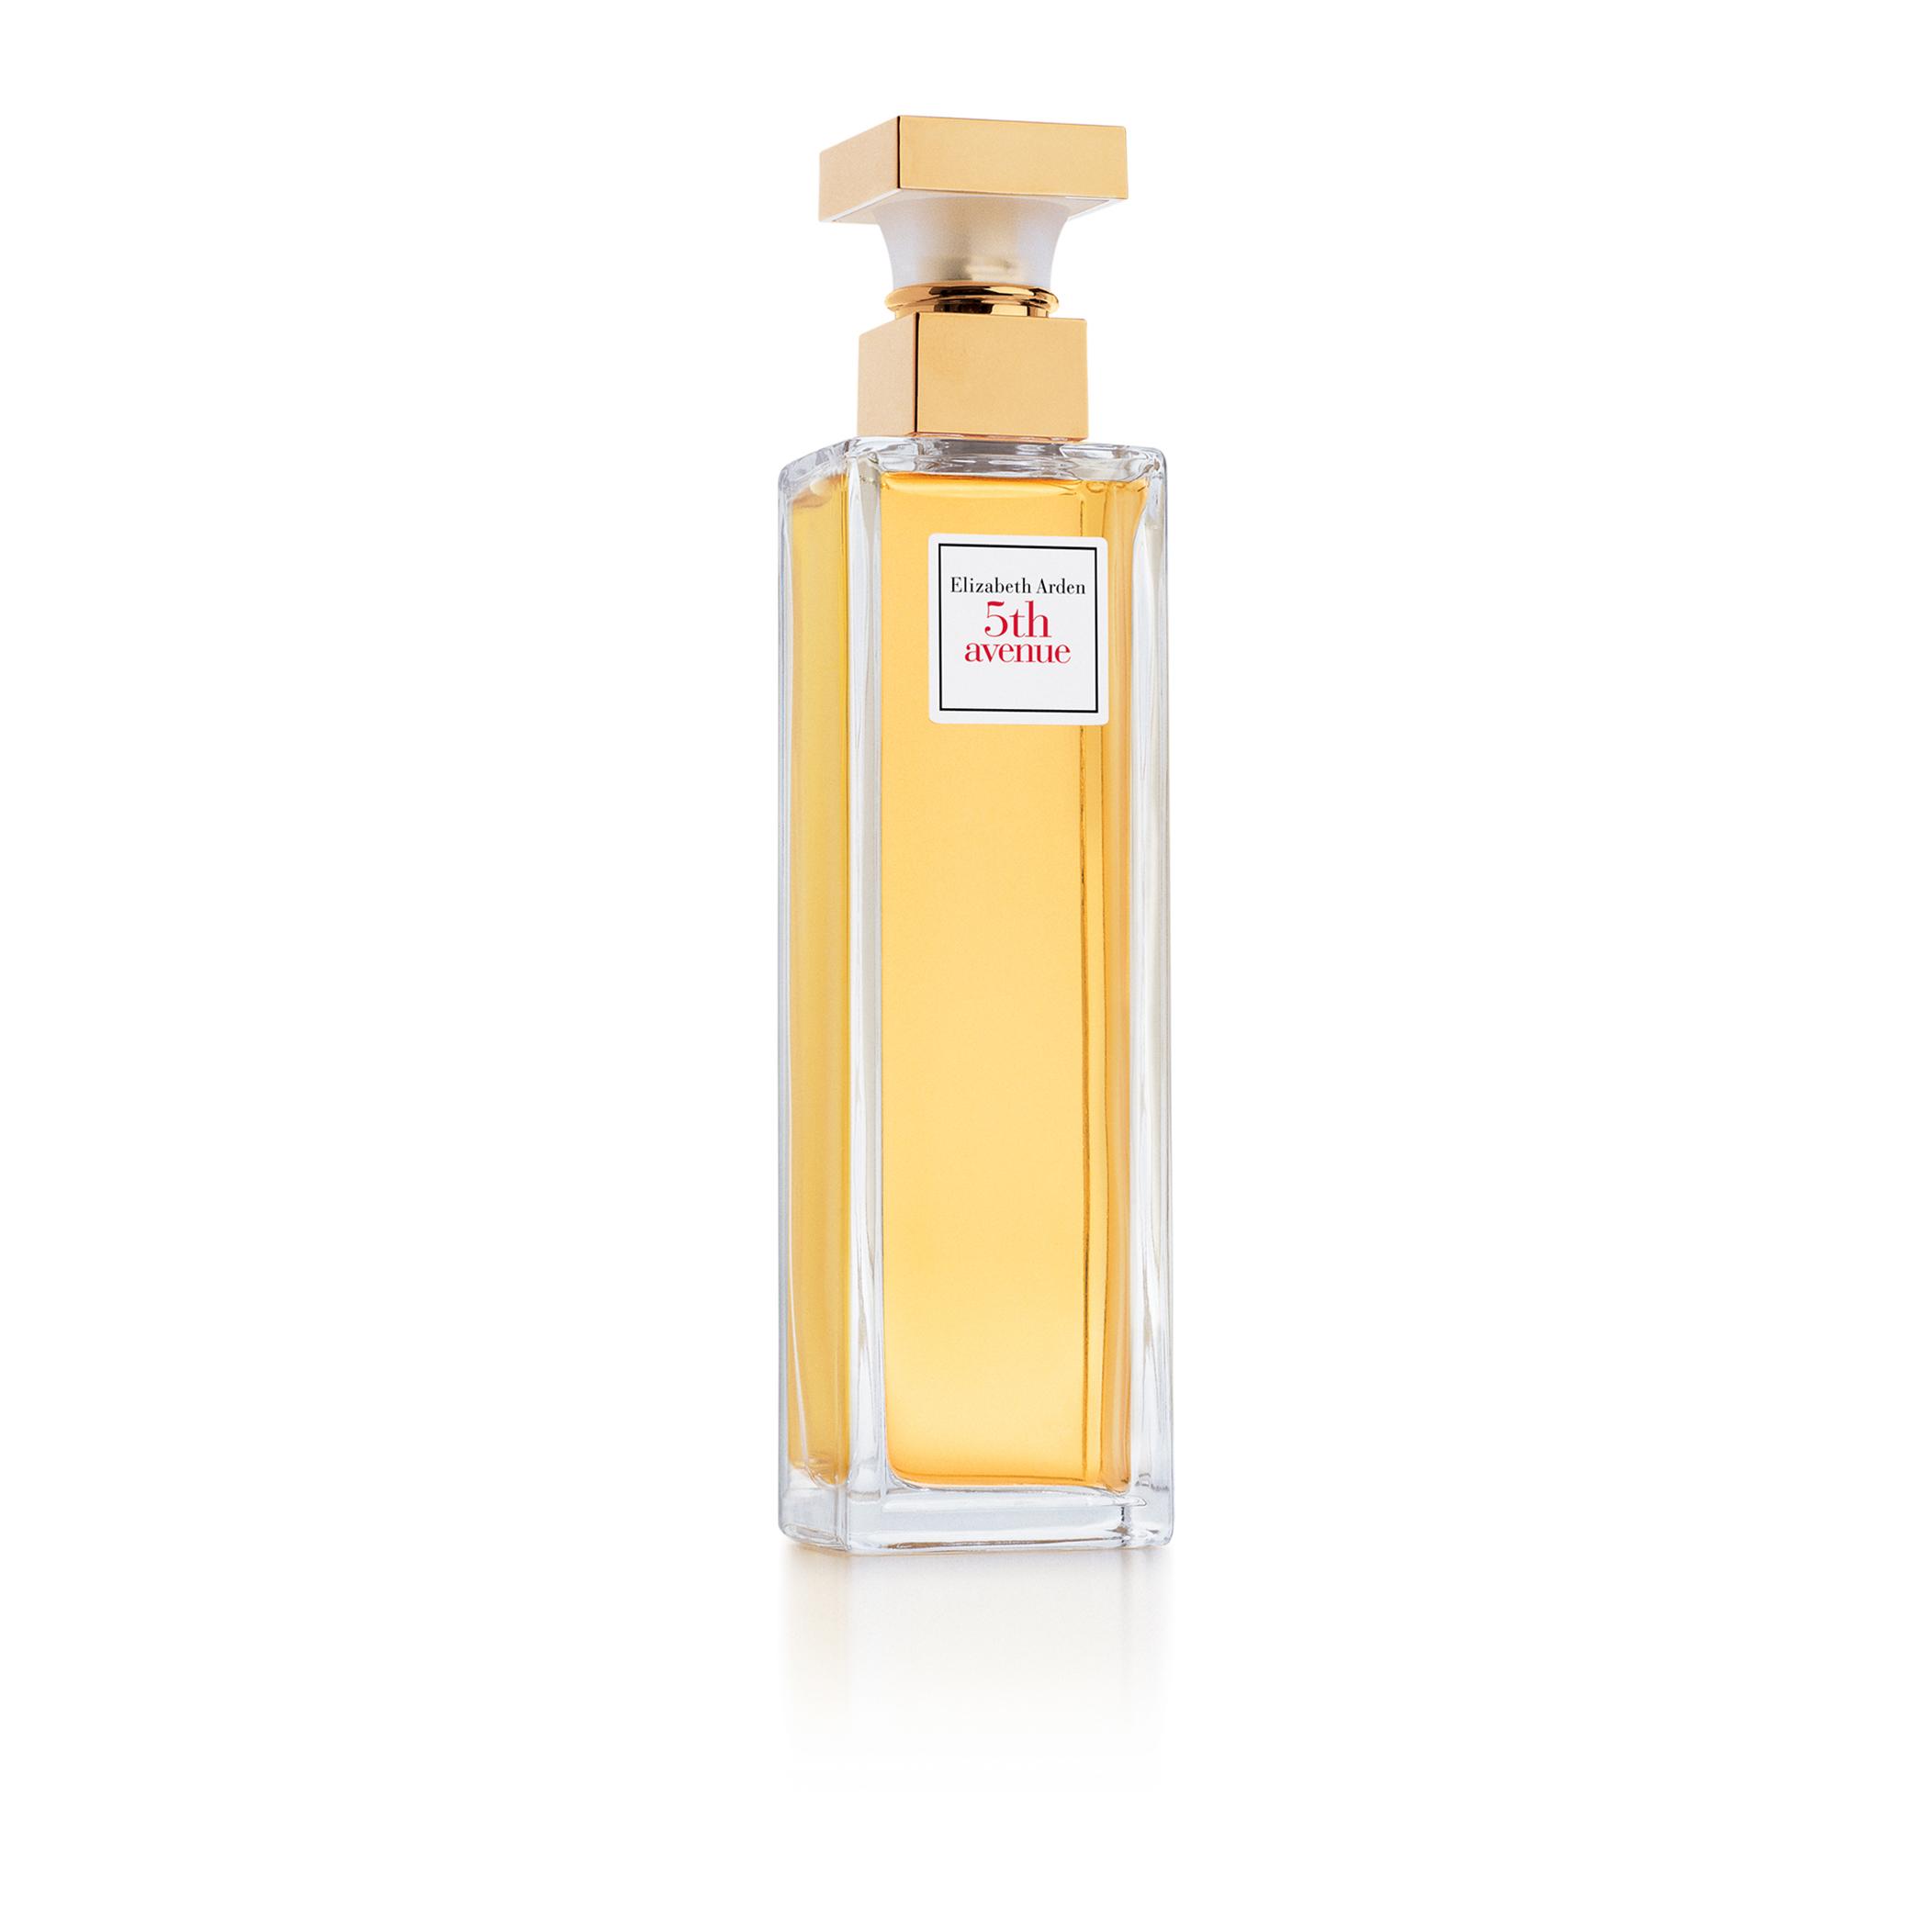 Elizabeth Arden 5th Avenue Perfume Spray